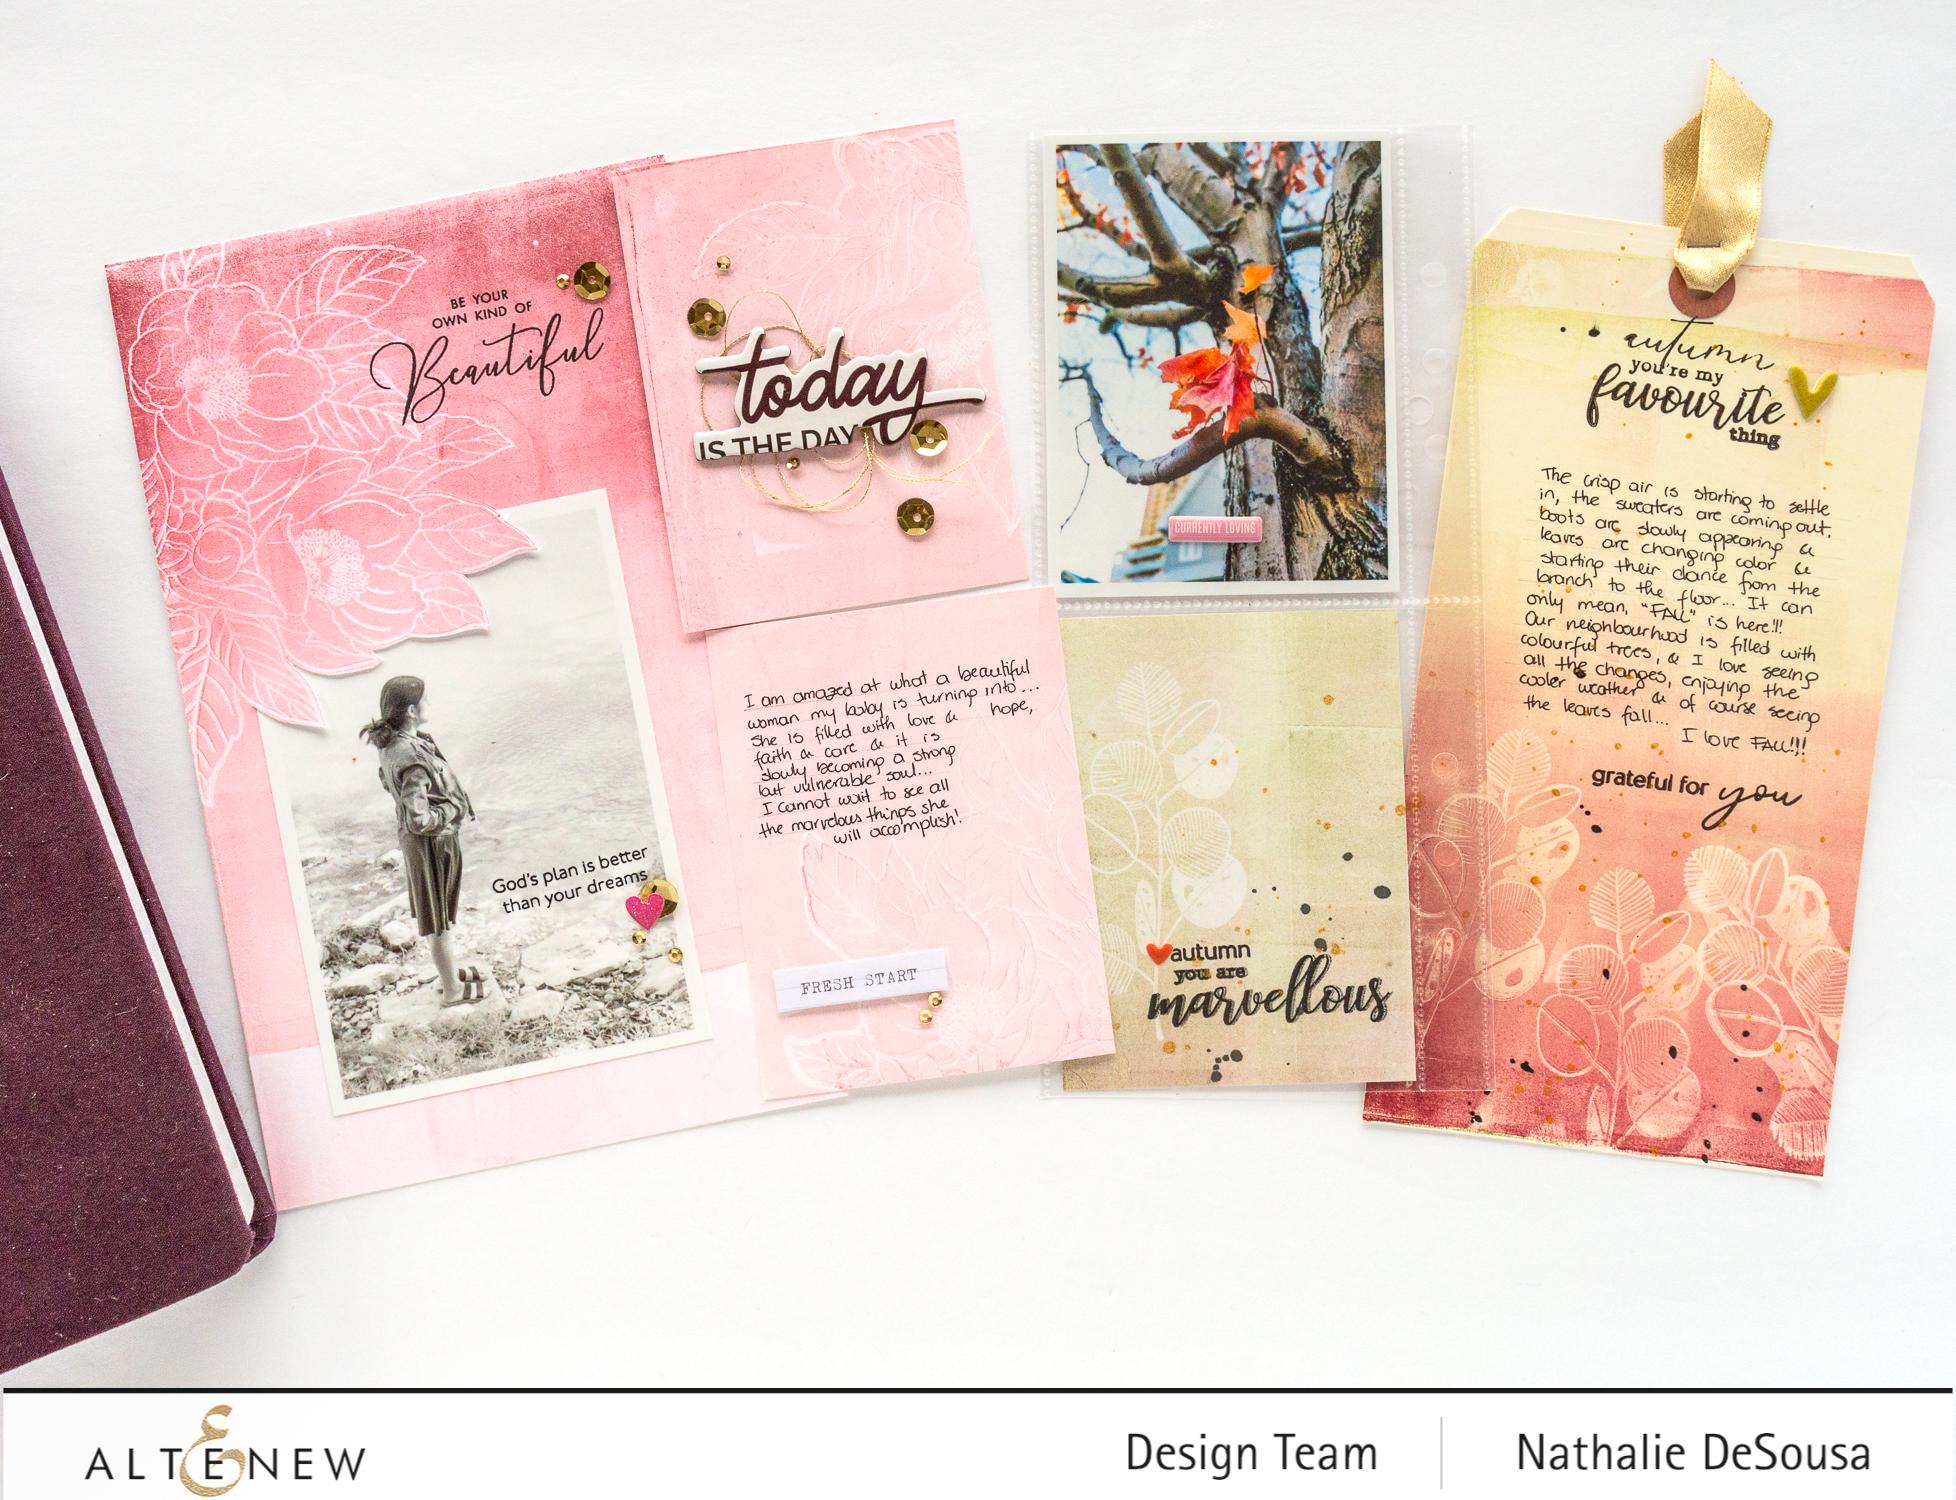 @altenew-monoprinting with Mixed Media inks _Nathalie DeSOusa